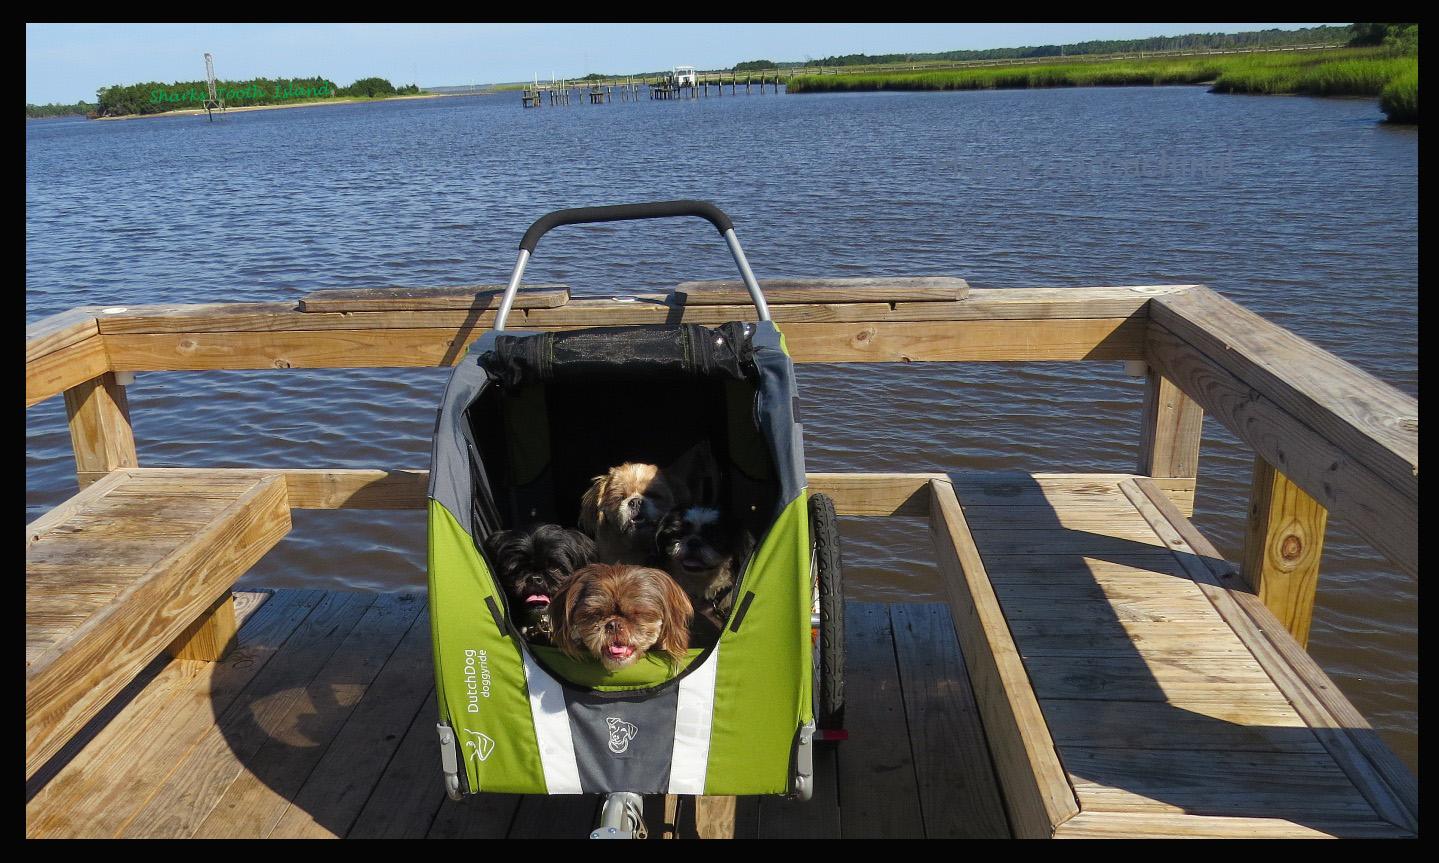 Shih Tzus in new stroller